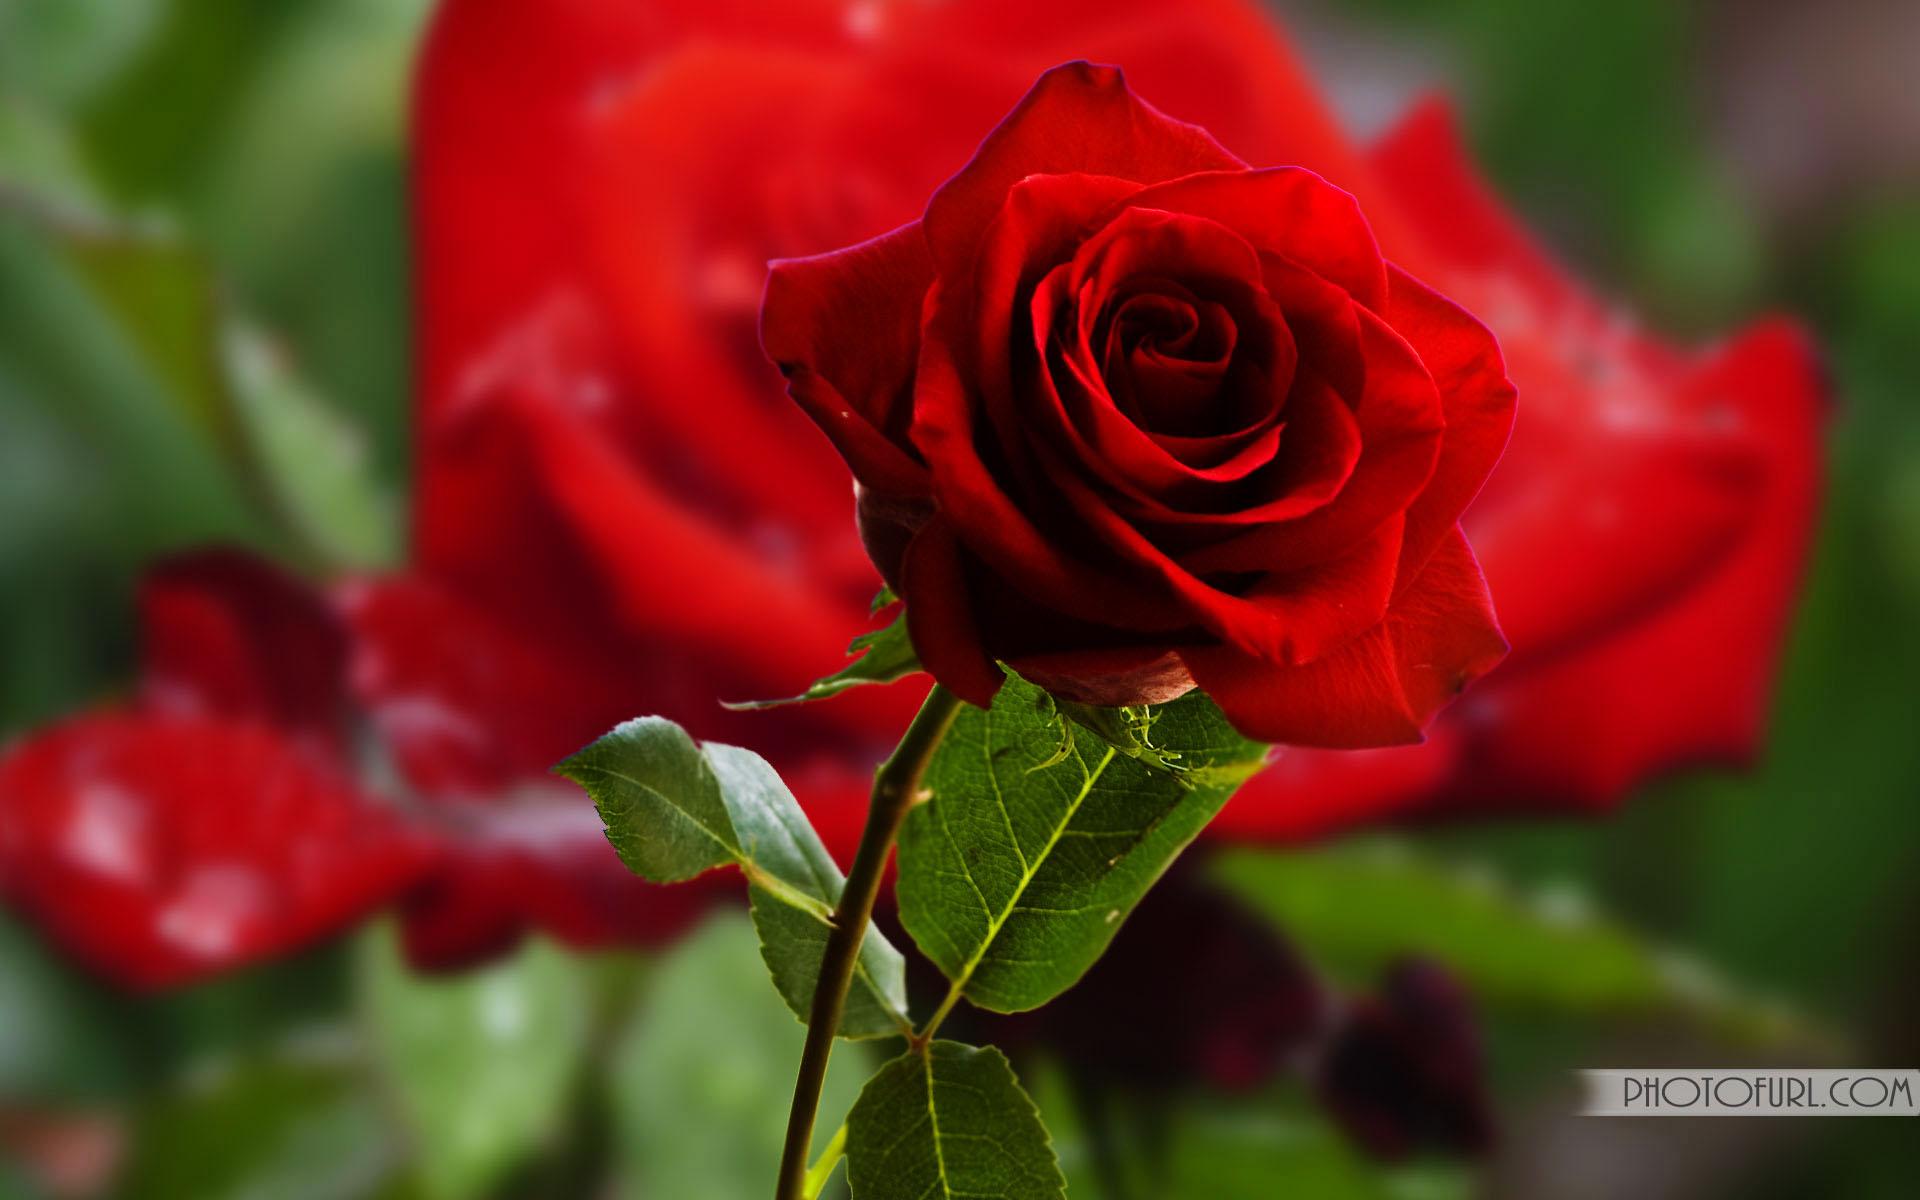 Most Beautiful Rose Flowers Hd Wallpaper